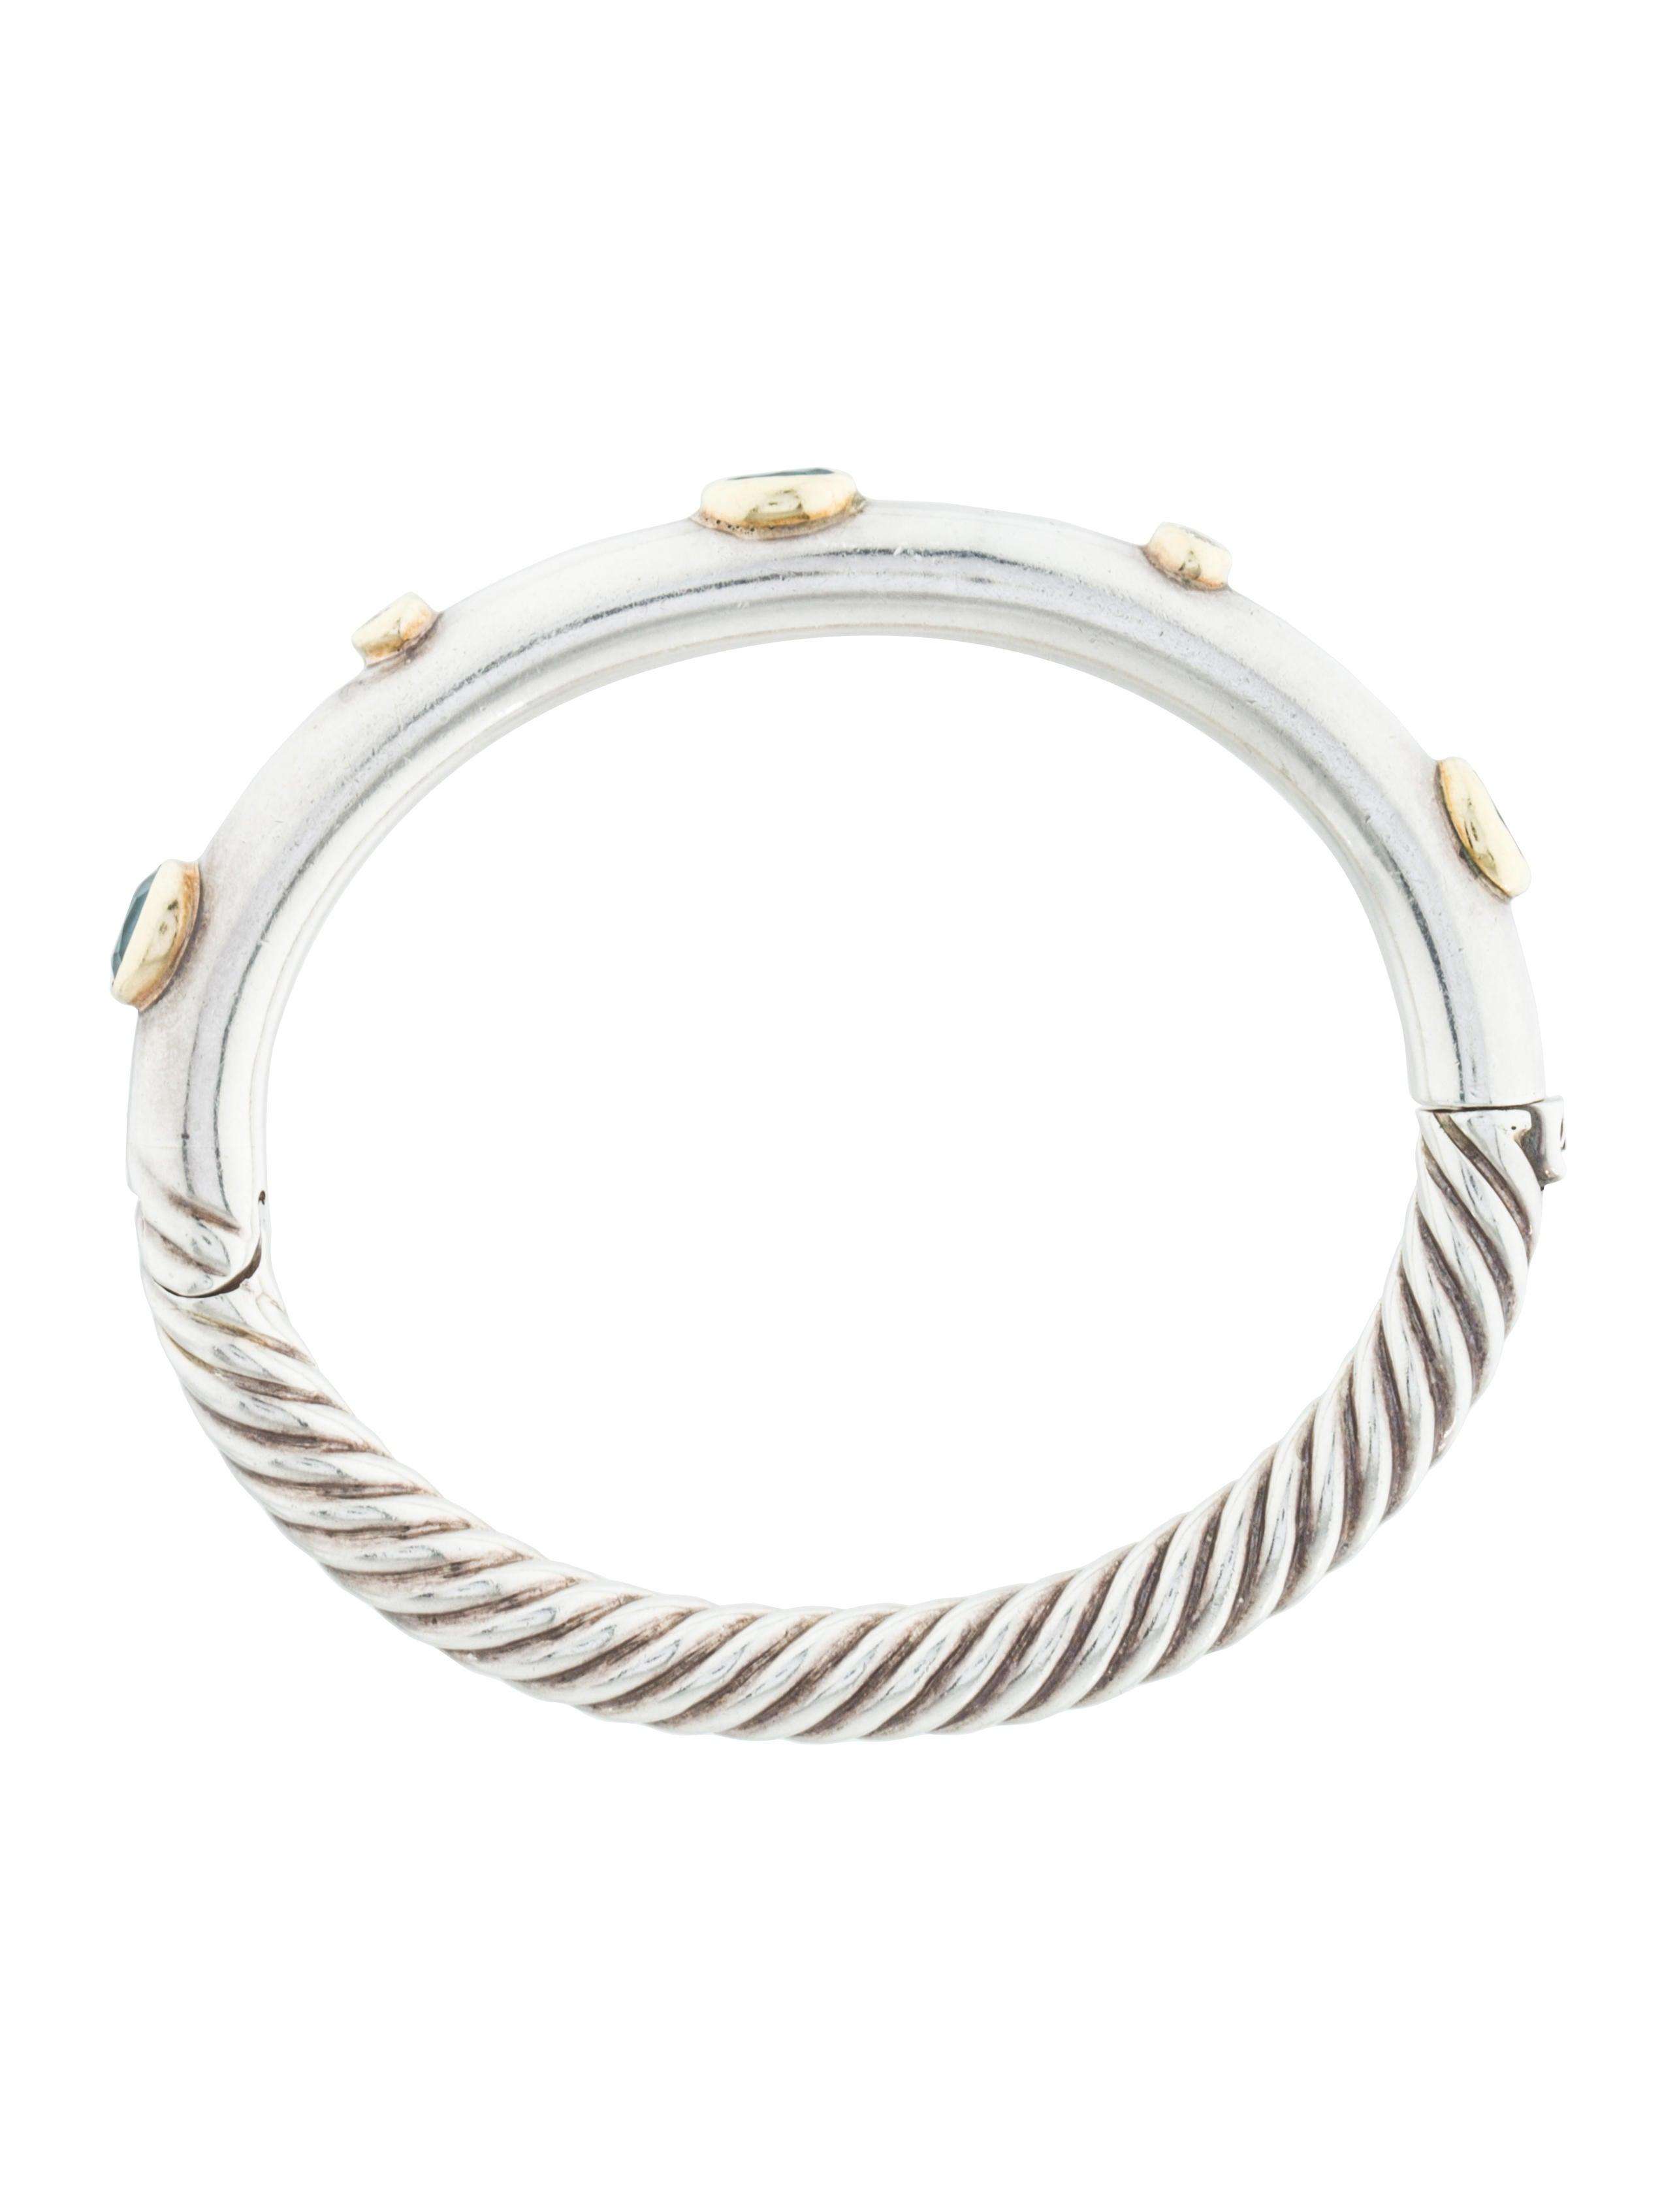 David Yurman Blue Topaz & Diamond Bangle Bracelet. Multi Bracelet. Beveled Engagement Rings. Sodalite Pendant. Beautiful Necklace. High End Jewelry. Marcasite Rings. French Cut Engagement Rings. Stainless Steel Chains